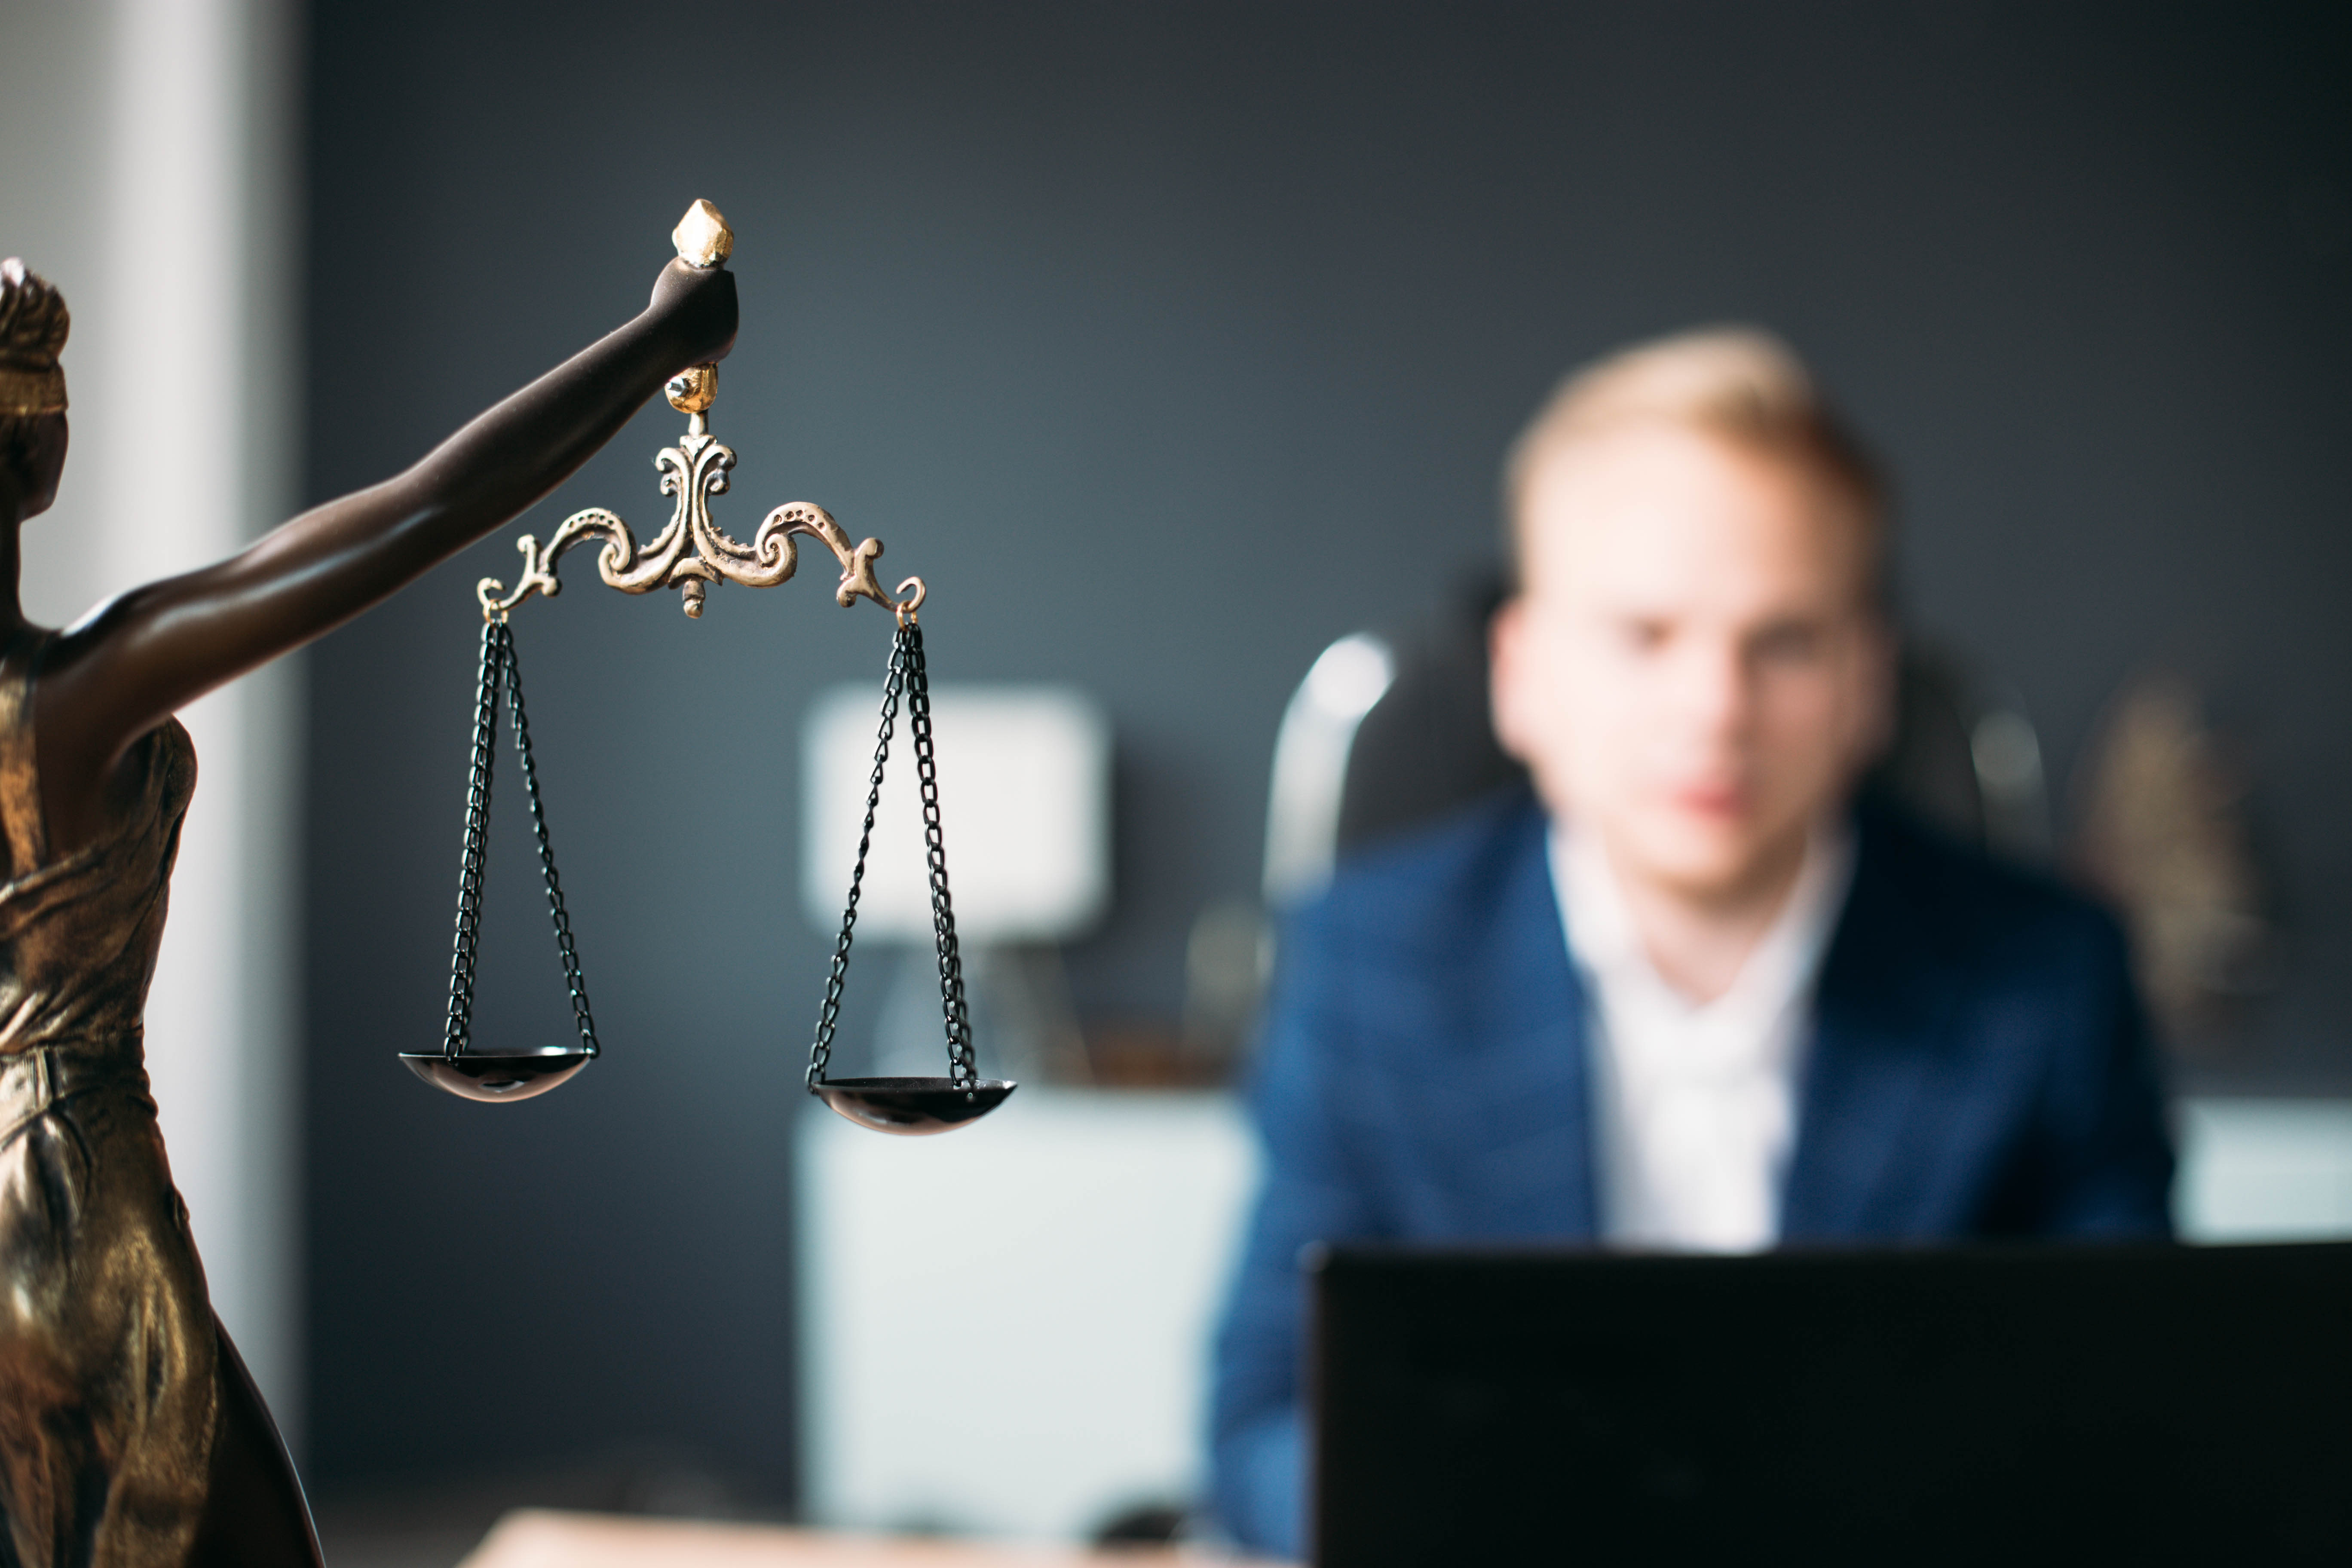 cms/images/new--anwalt-anwaeltin-gehalt/Anwalt.jpg